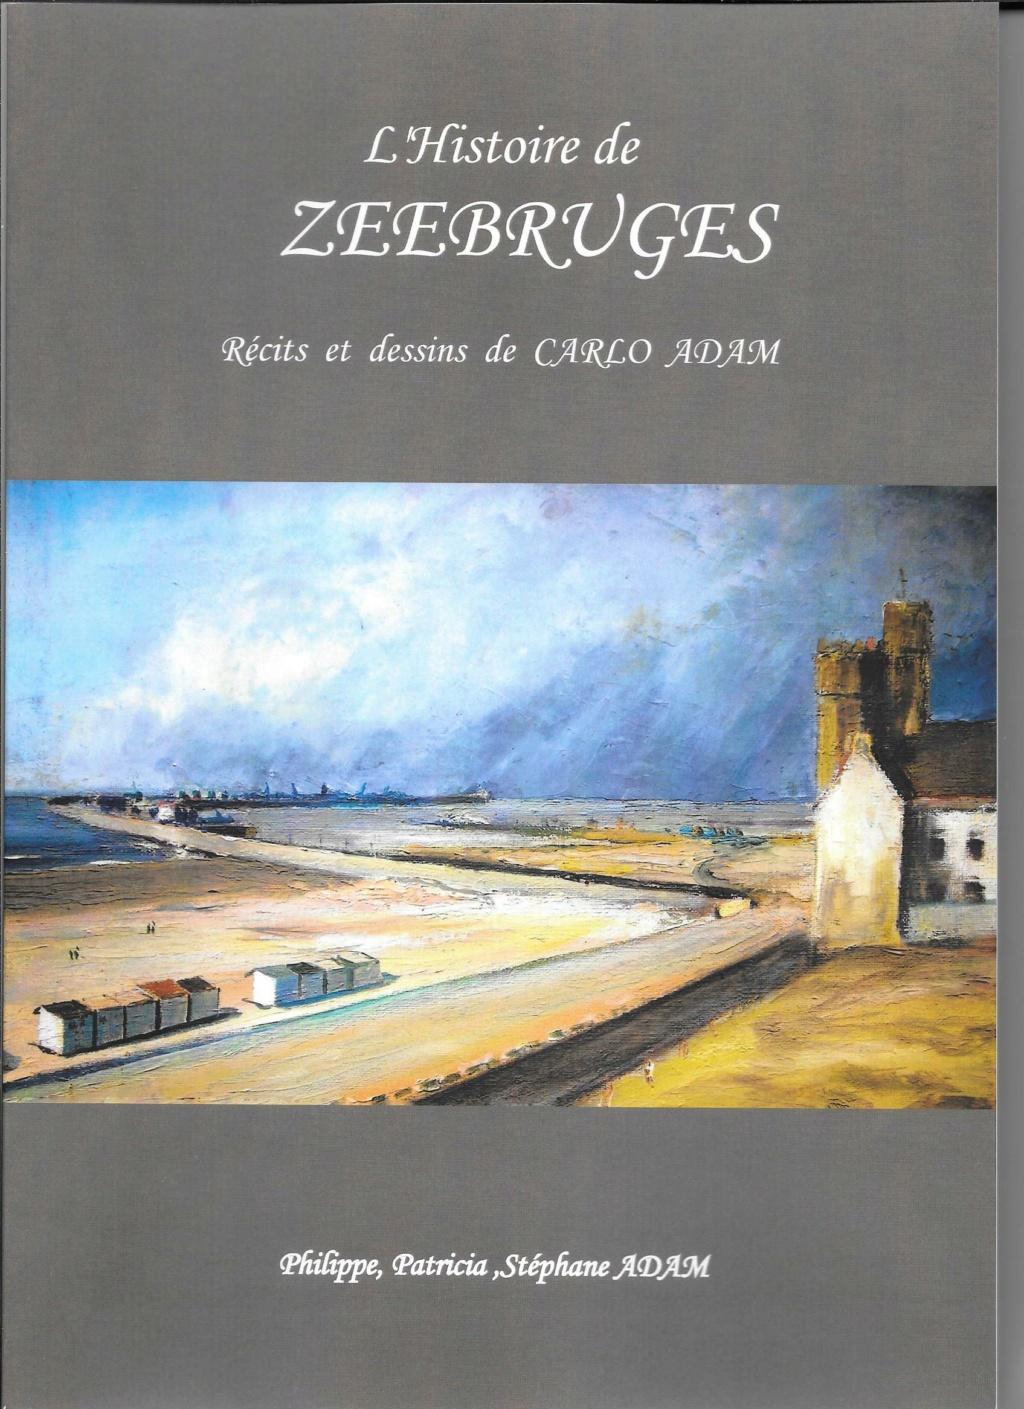 Port de Zeebrugge (vidéo, news, etc...) - Page 2 Zeebru10